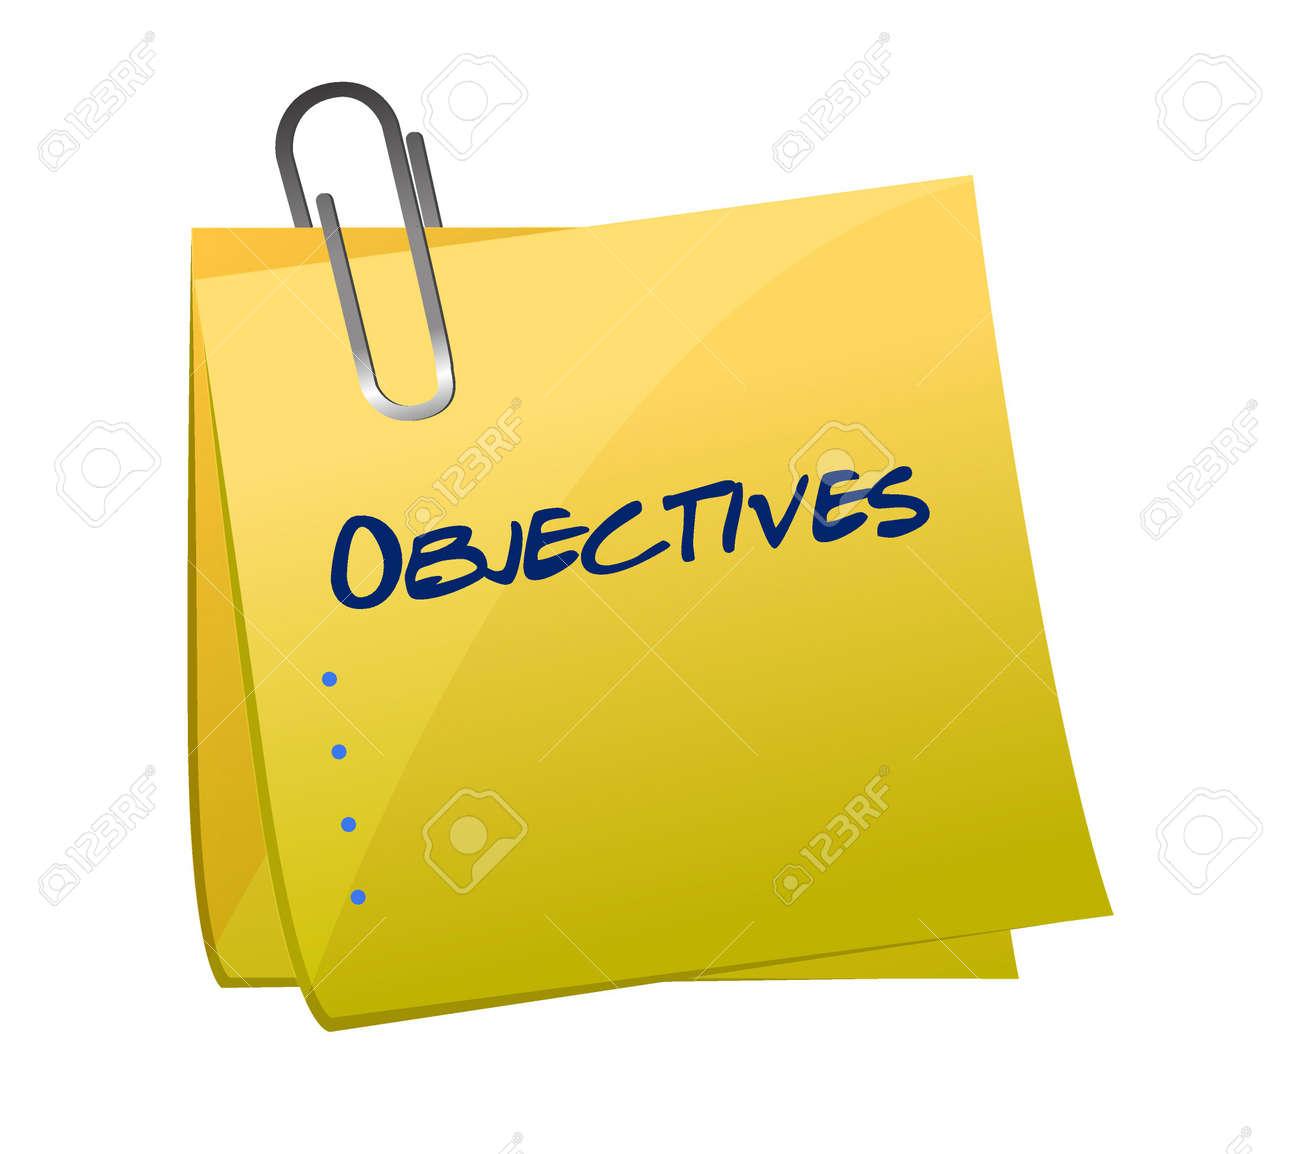 memorandum cliparts stock vector and royalty memorandum objectives memo post illustration design graphic background illustration